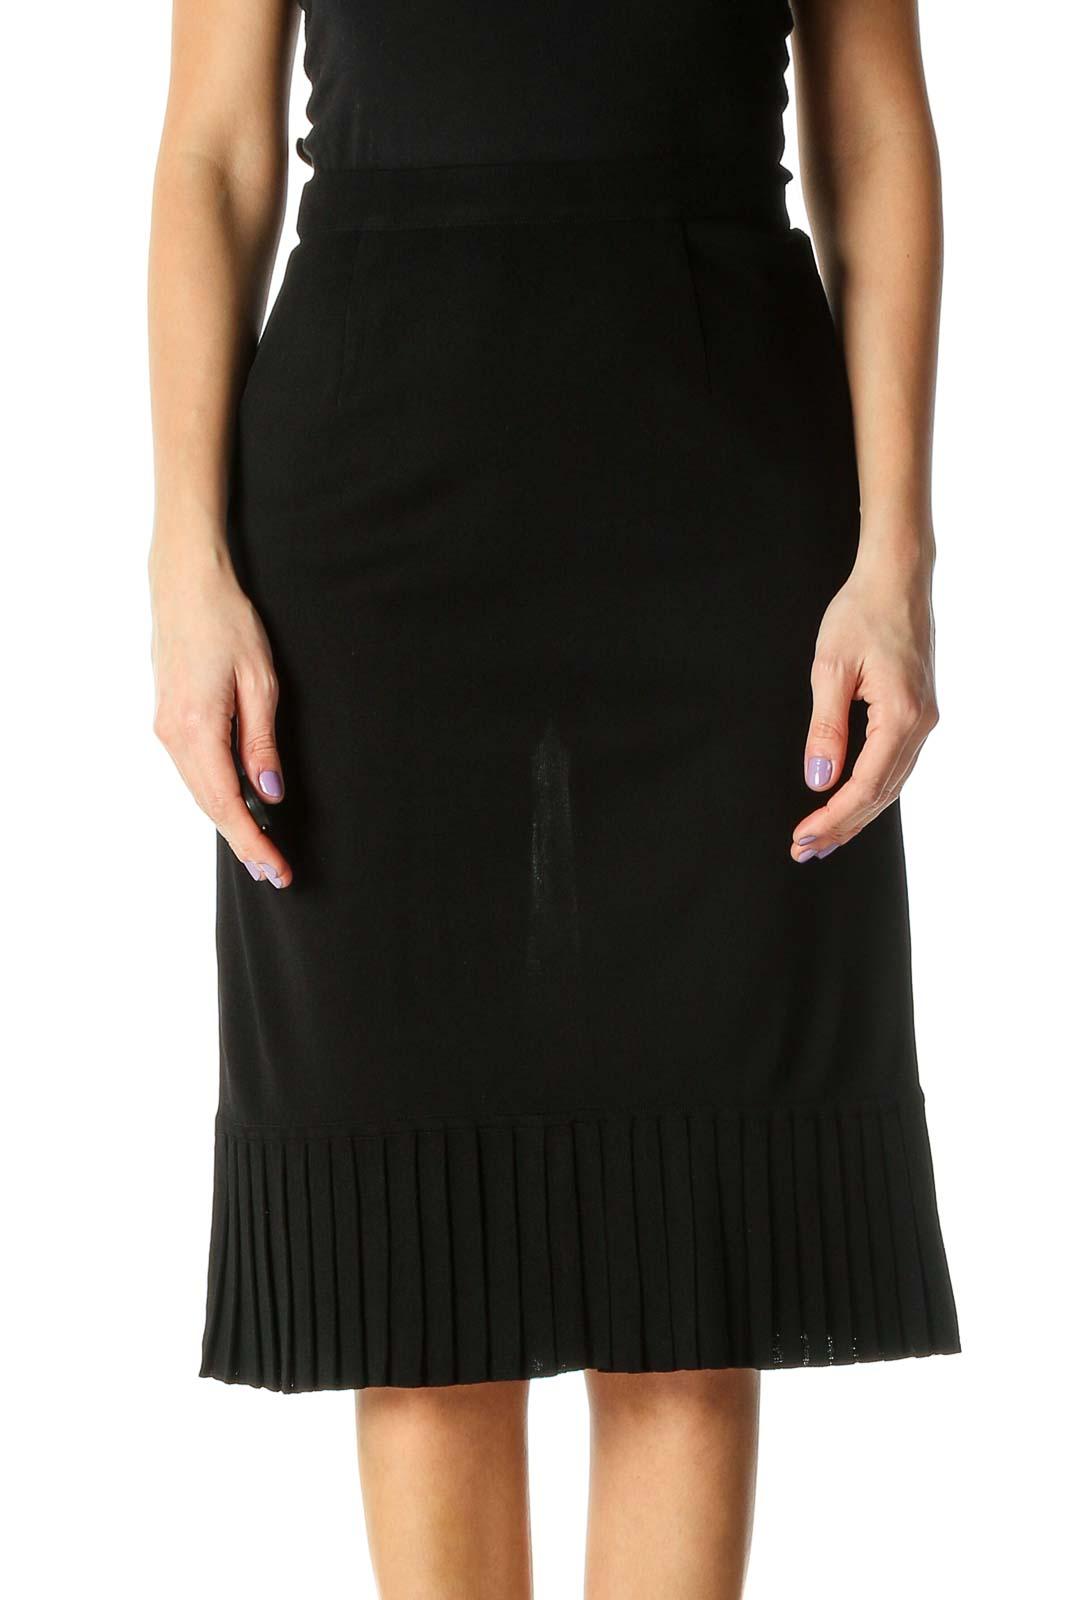 Black Solid Retro Pencil Skirt Front